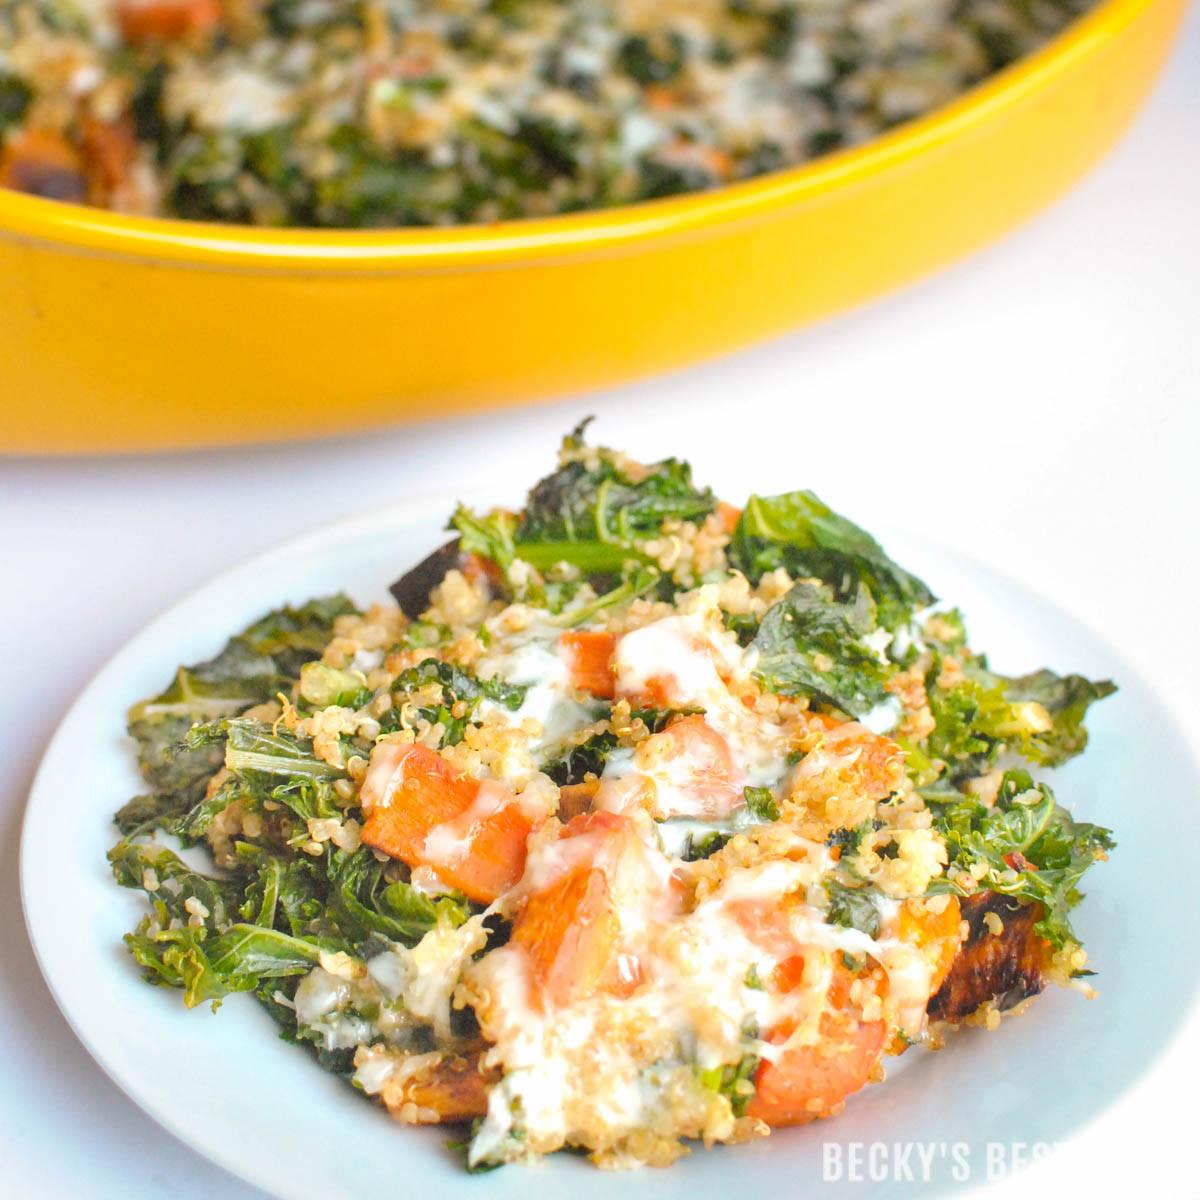 Healthy Vegetable Casserole  Kale & Roasted Ve able Quinoa Casserole